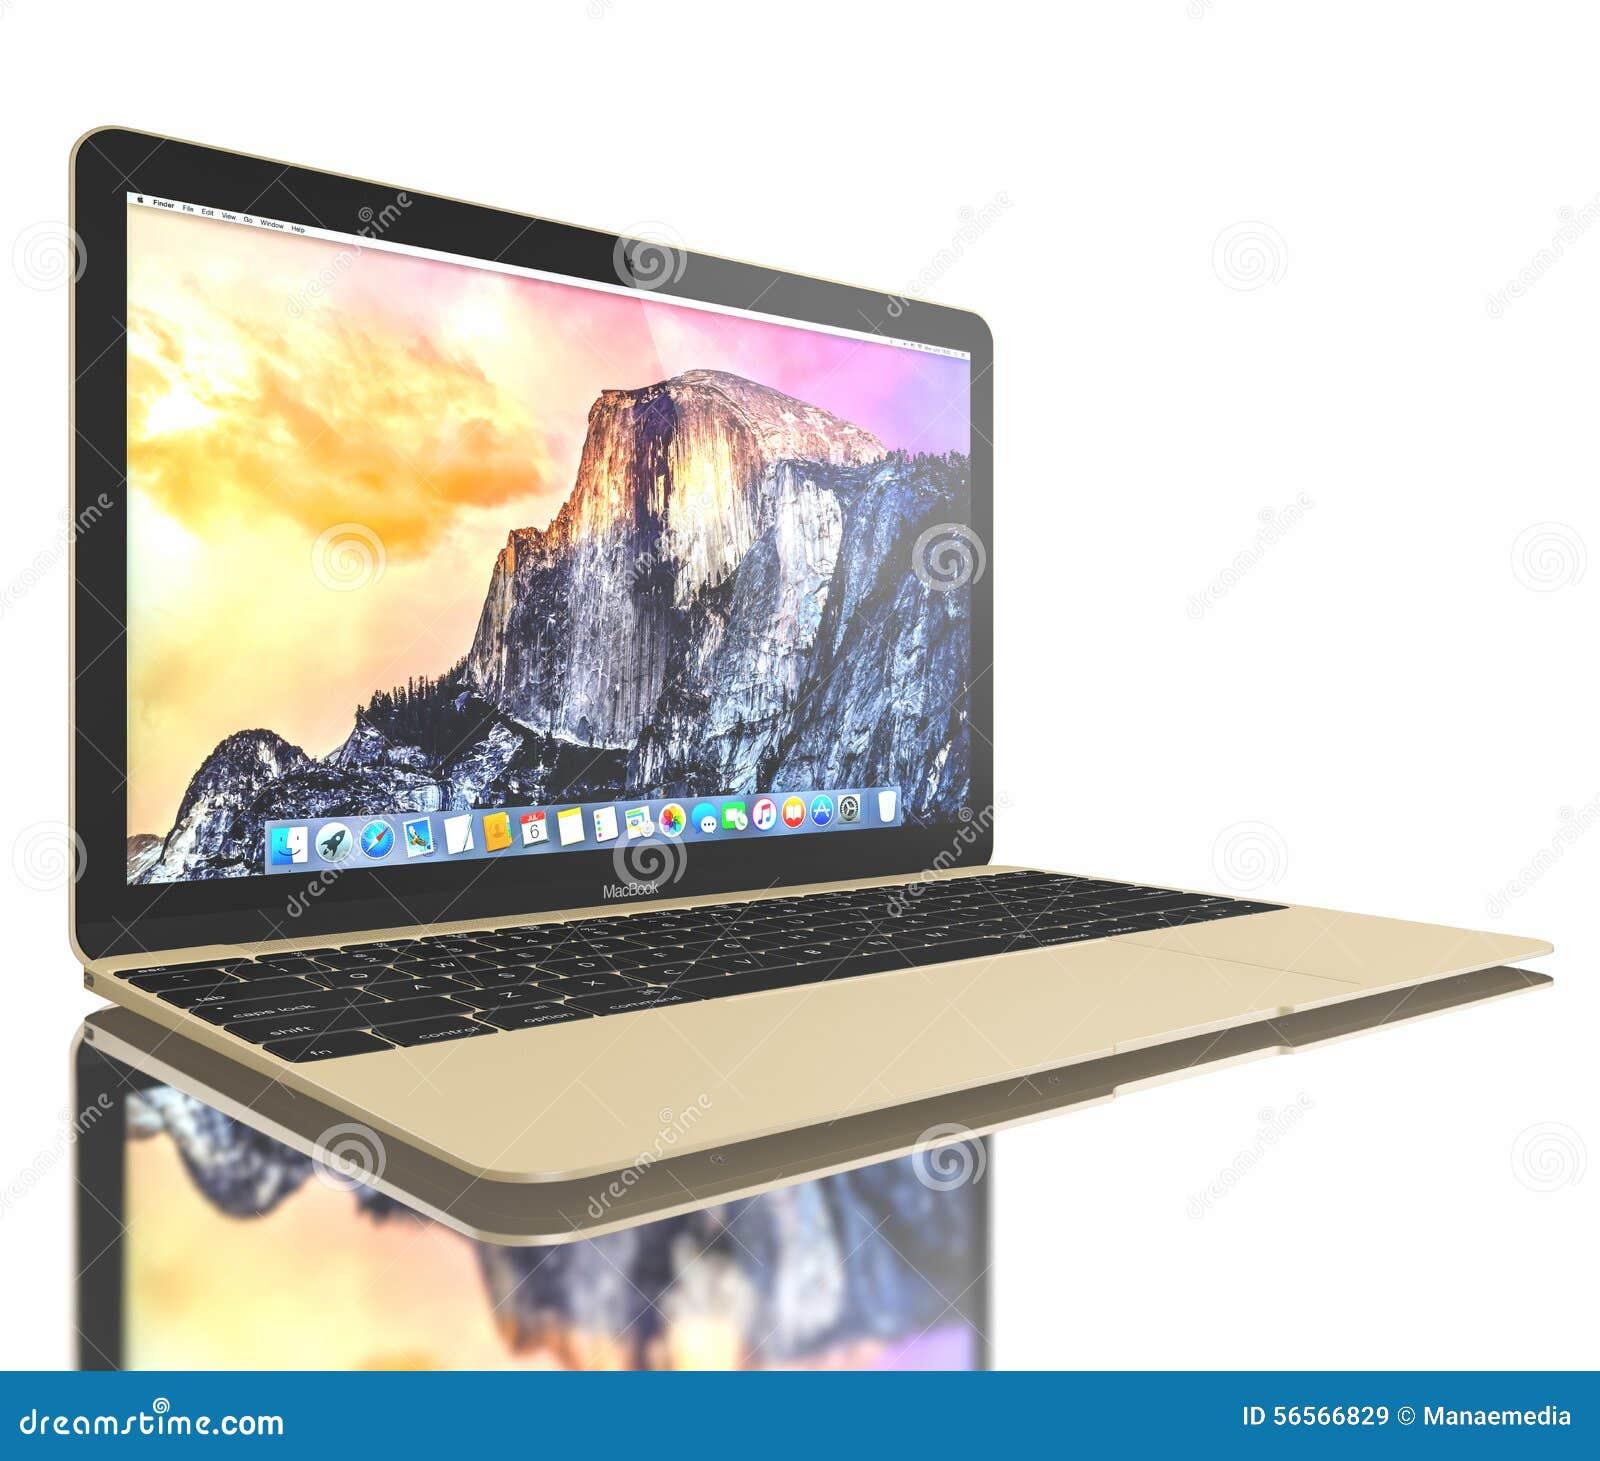 Download Νέος χρυσός αέρας MacBook εκδοτική στοκ εικόνα. εικόνα από υπολογιστές - 56566829